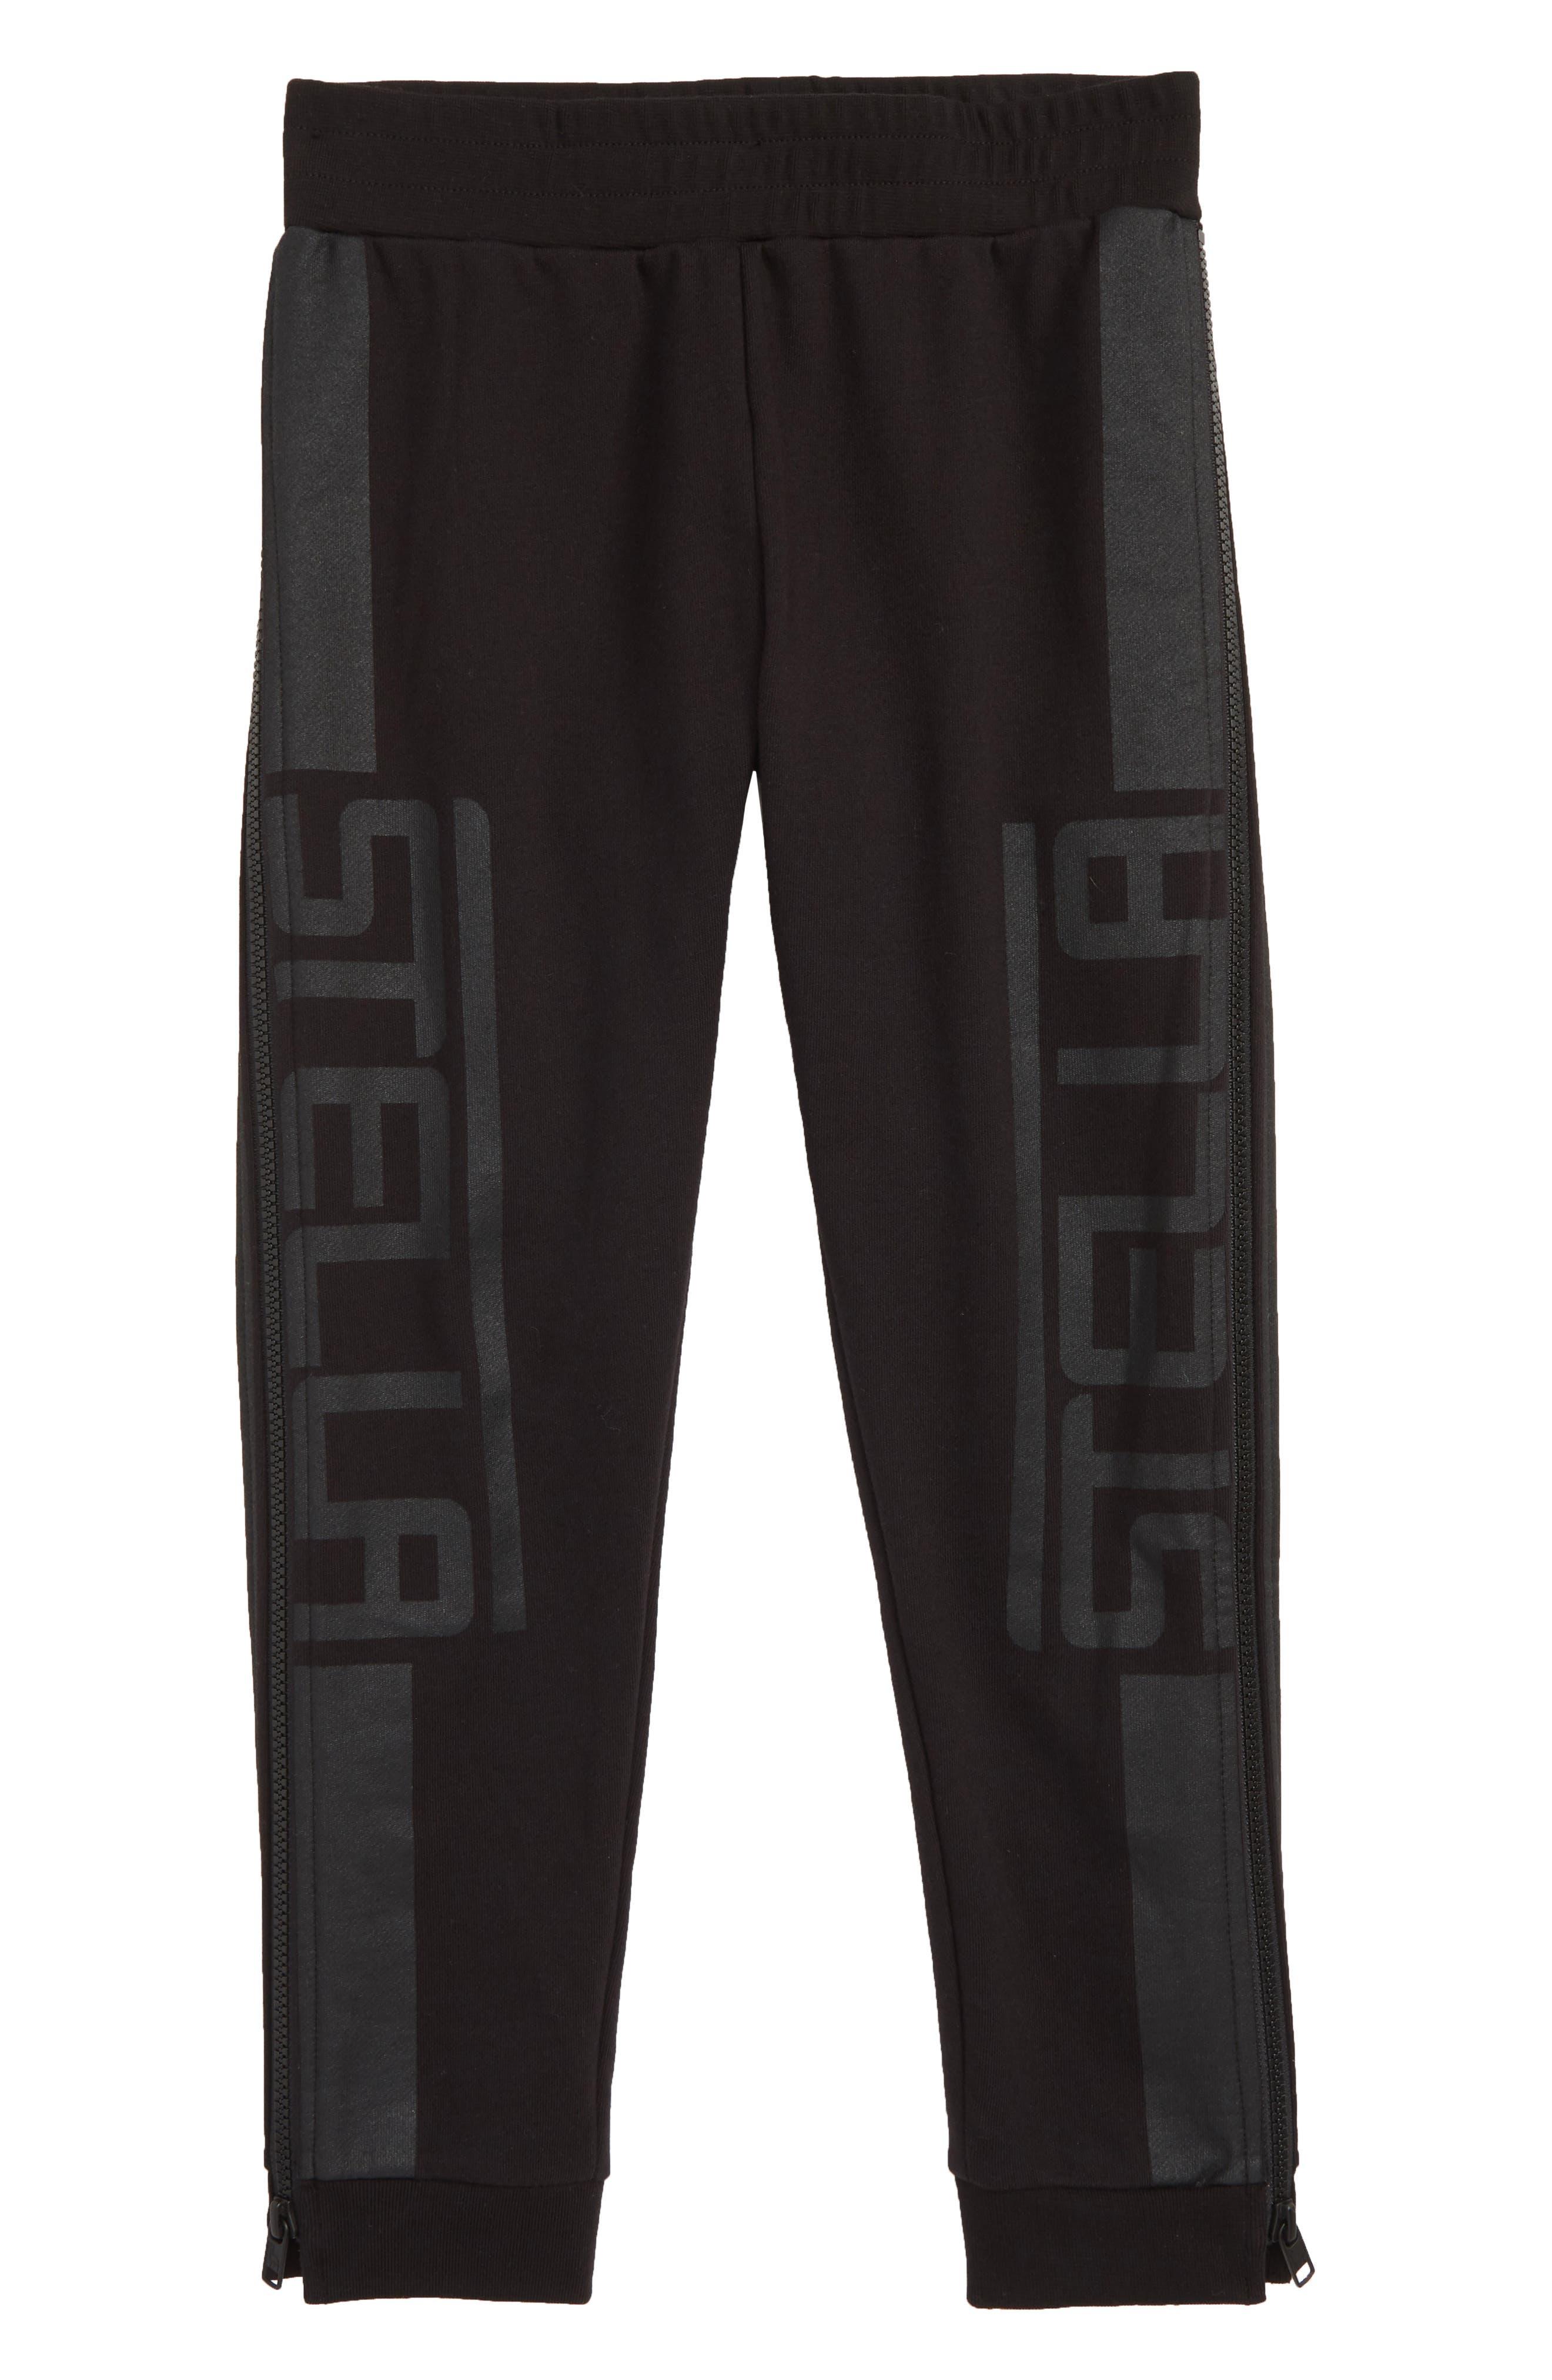 Stella McCartney Logo Sweatpants,                             Main thumbnail 1, color,                             BLACK